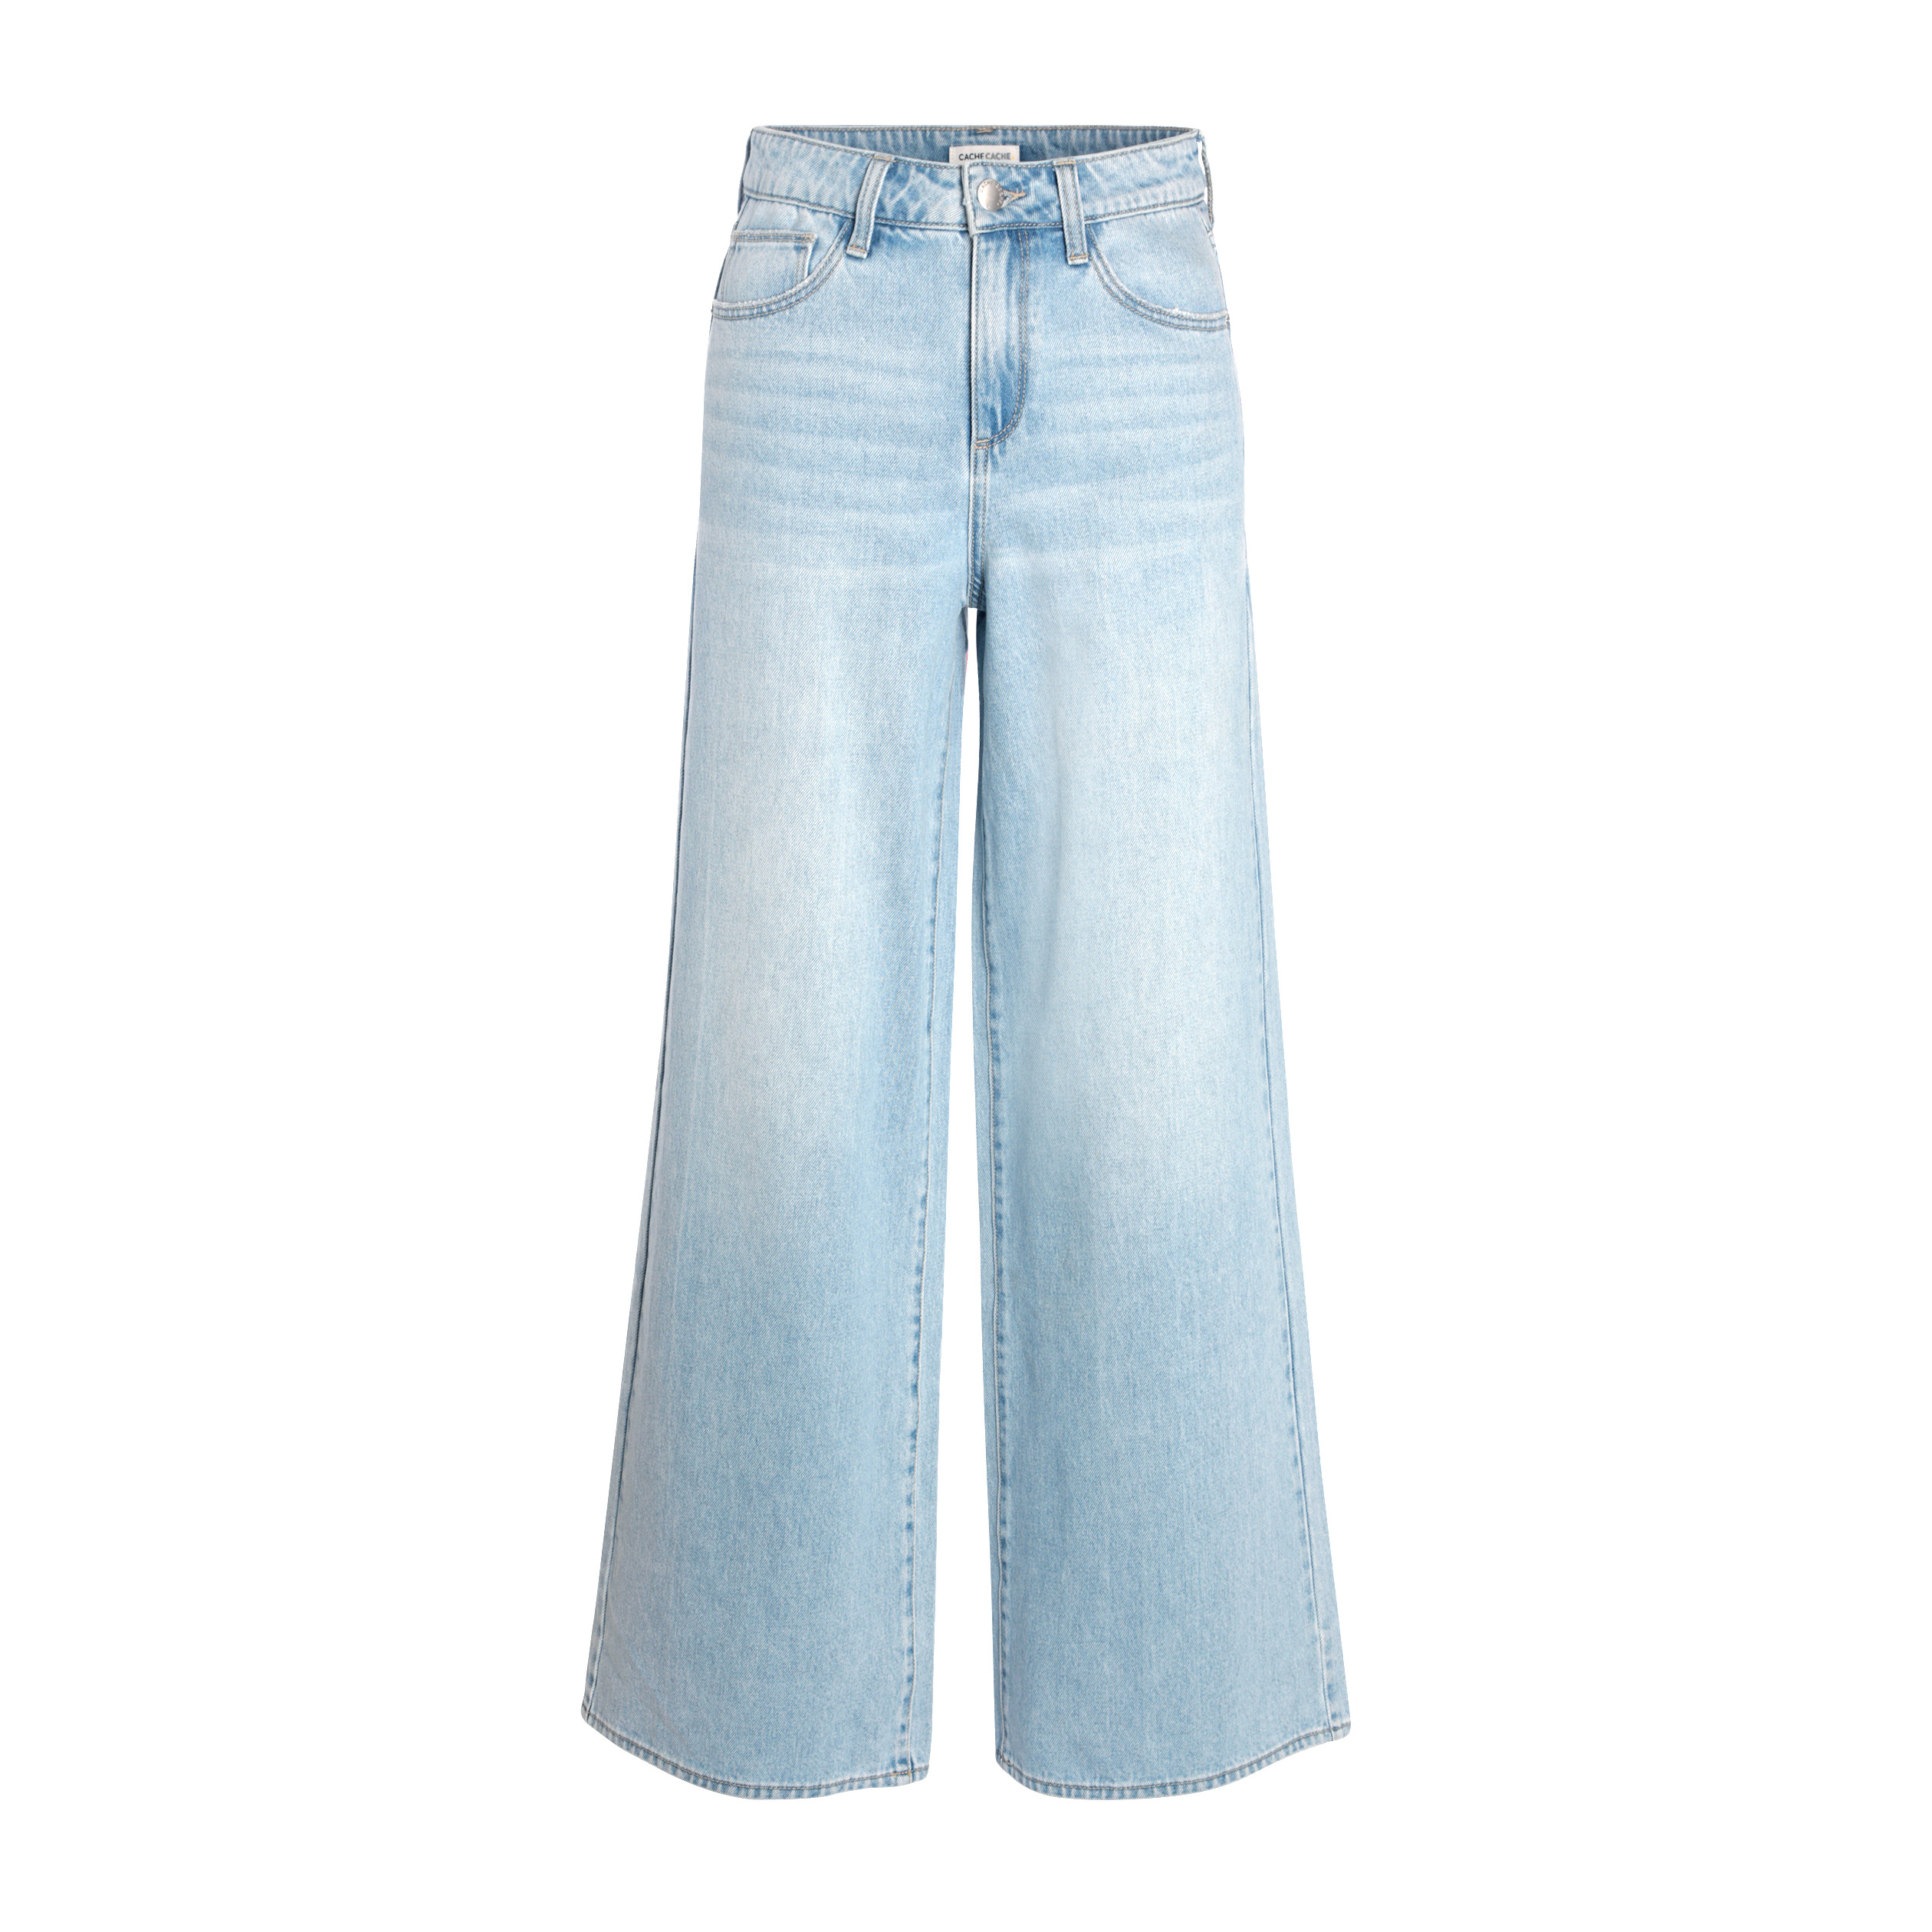 Large Denim Jeans Double Stone Femme lFKTc3u51J